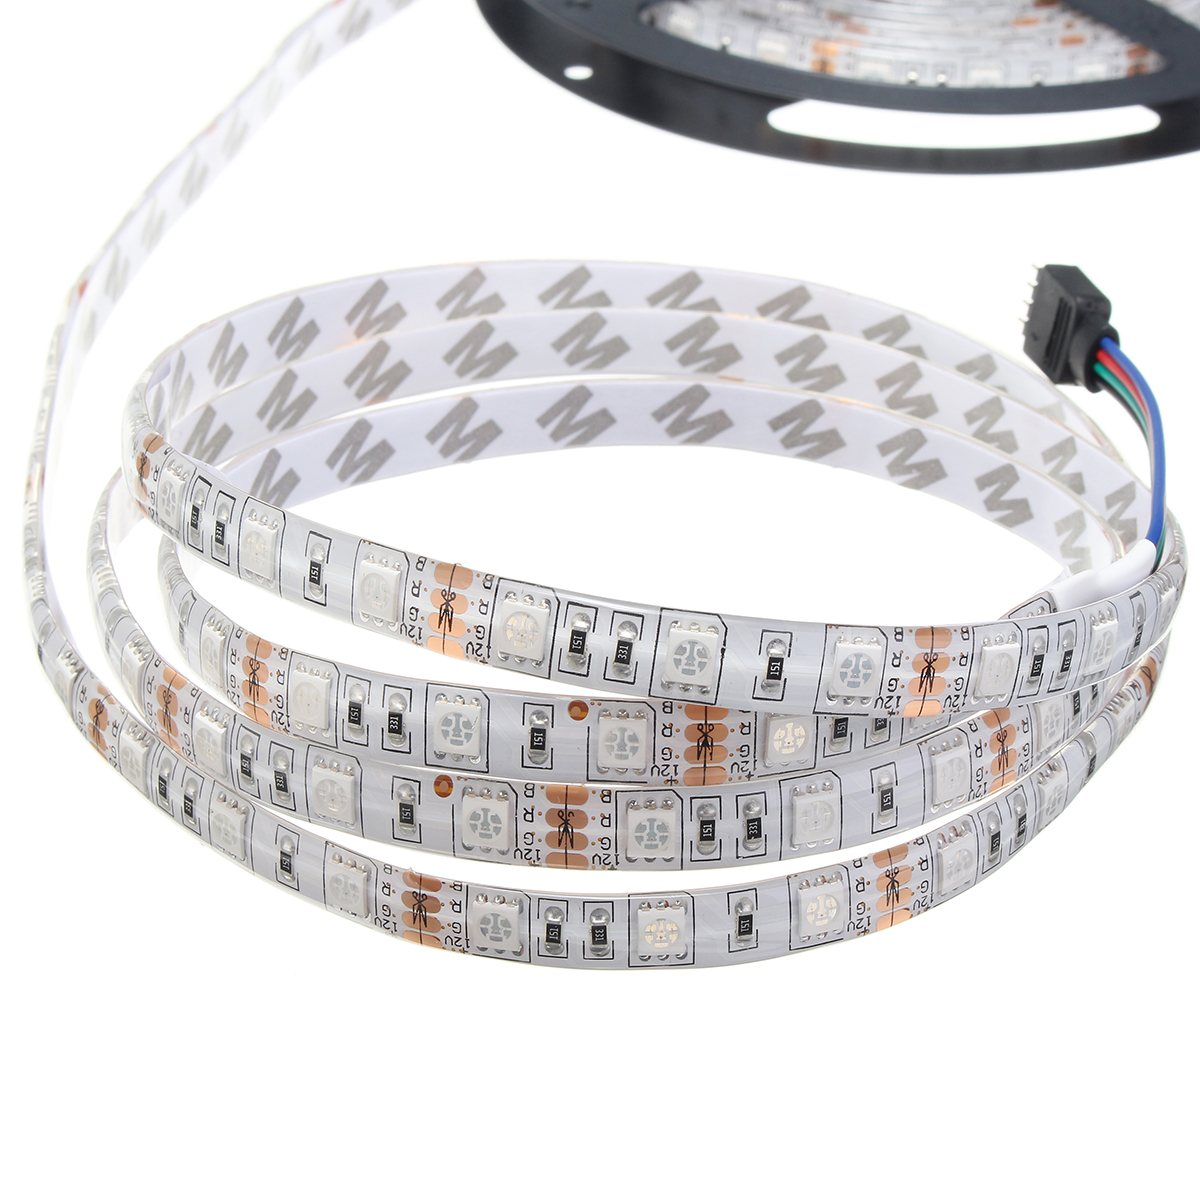 Smuxi 5050 5M/16.4Ft Smart Wifi RGB 300 Waterproof LED Strip Lights WIFI Intelligent Controller For Alexa Google Home IR UK